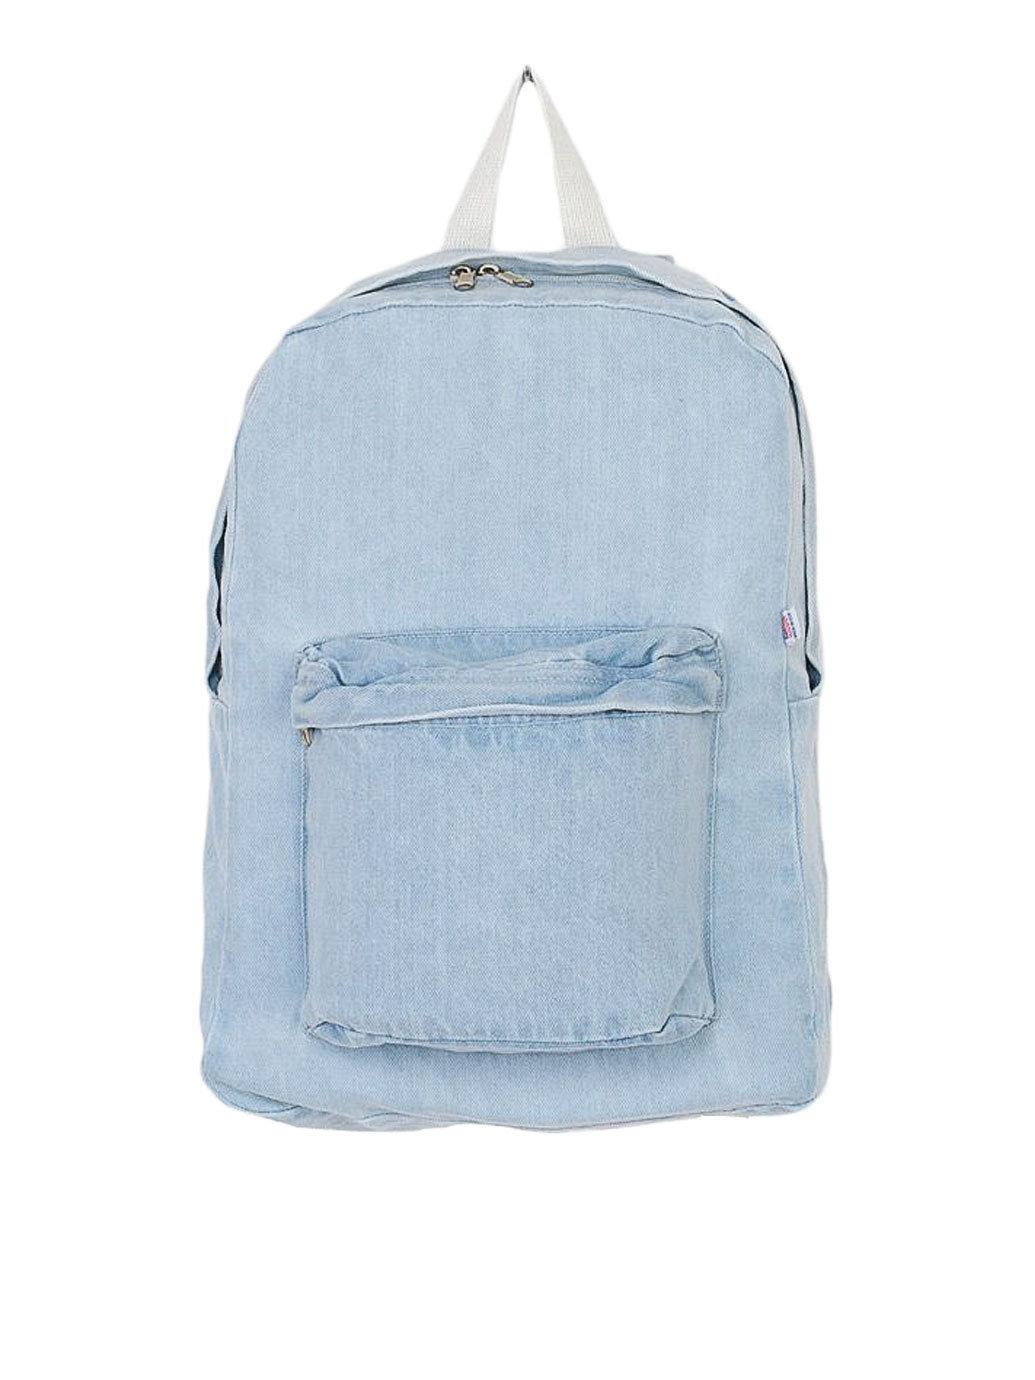 American apparel Denim School Bag in Metallic   Lyst